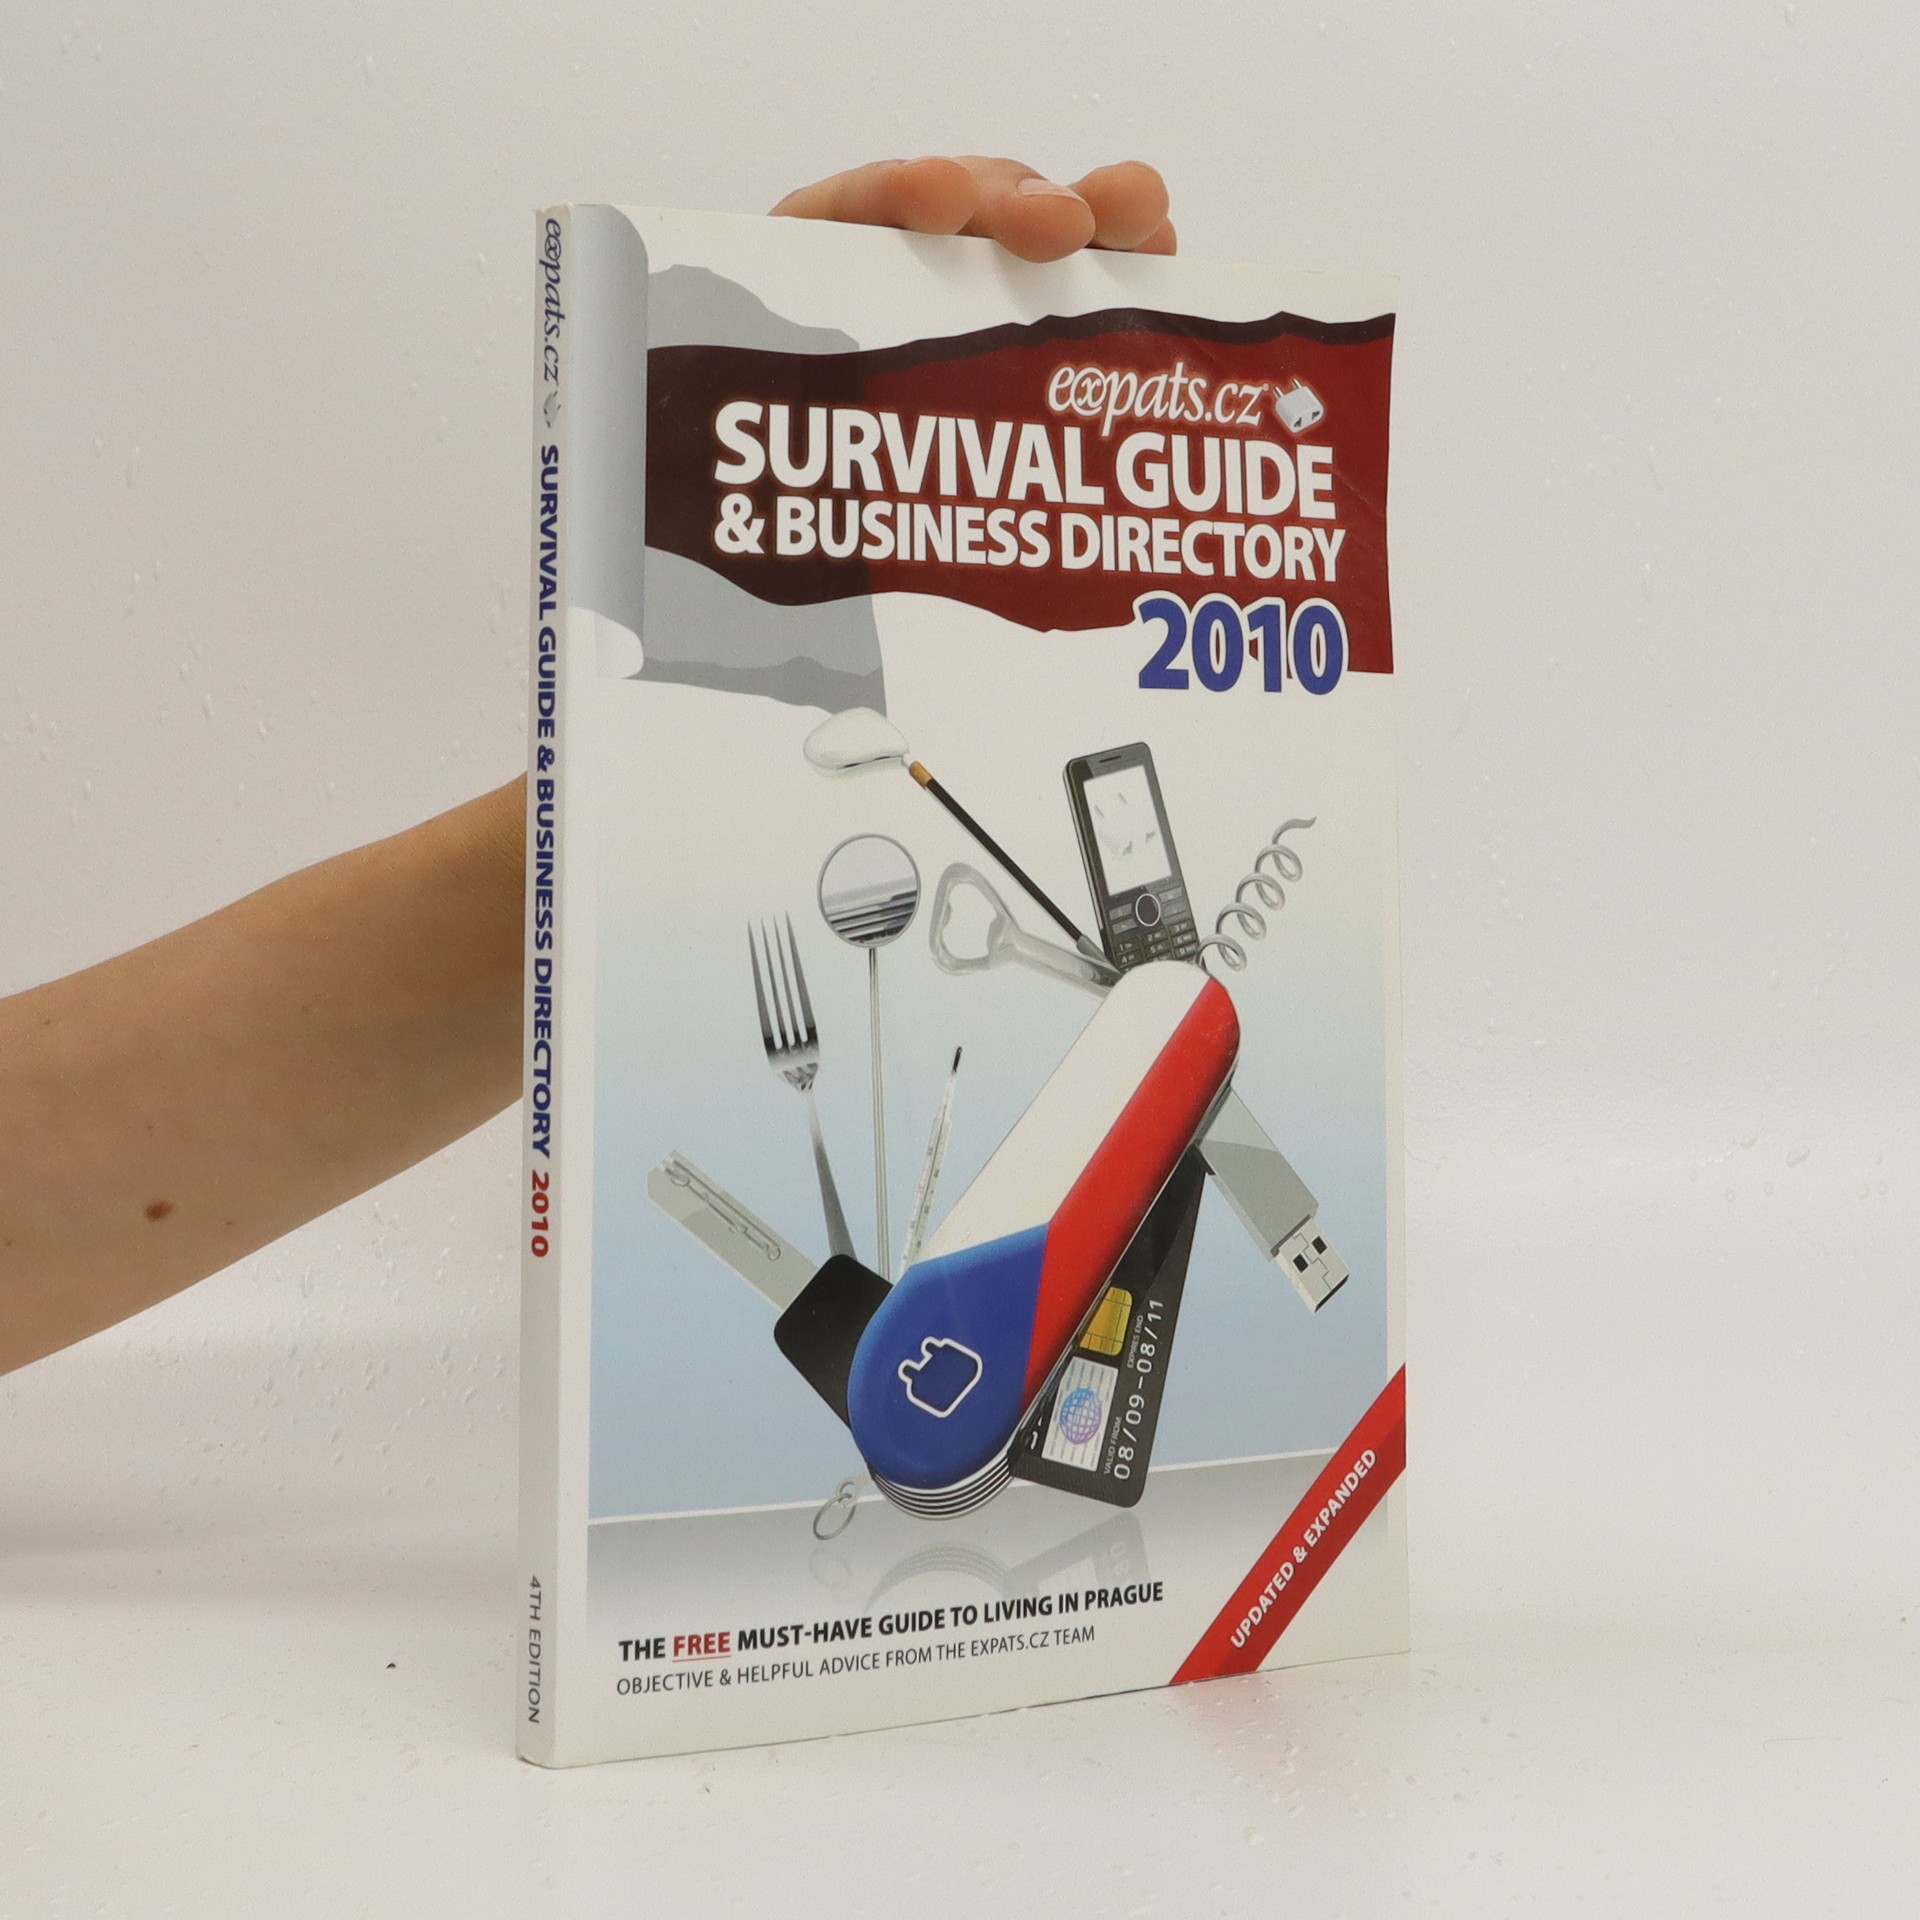 antikvární kniha Survival guide and business directory 2010, neuveden